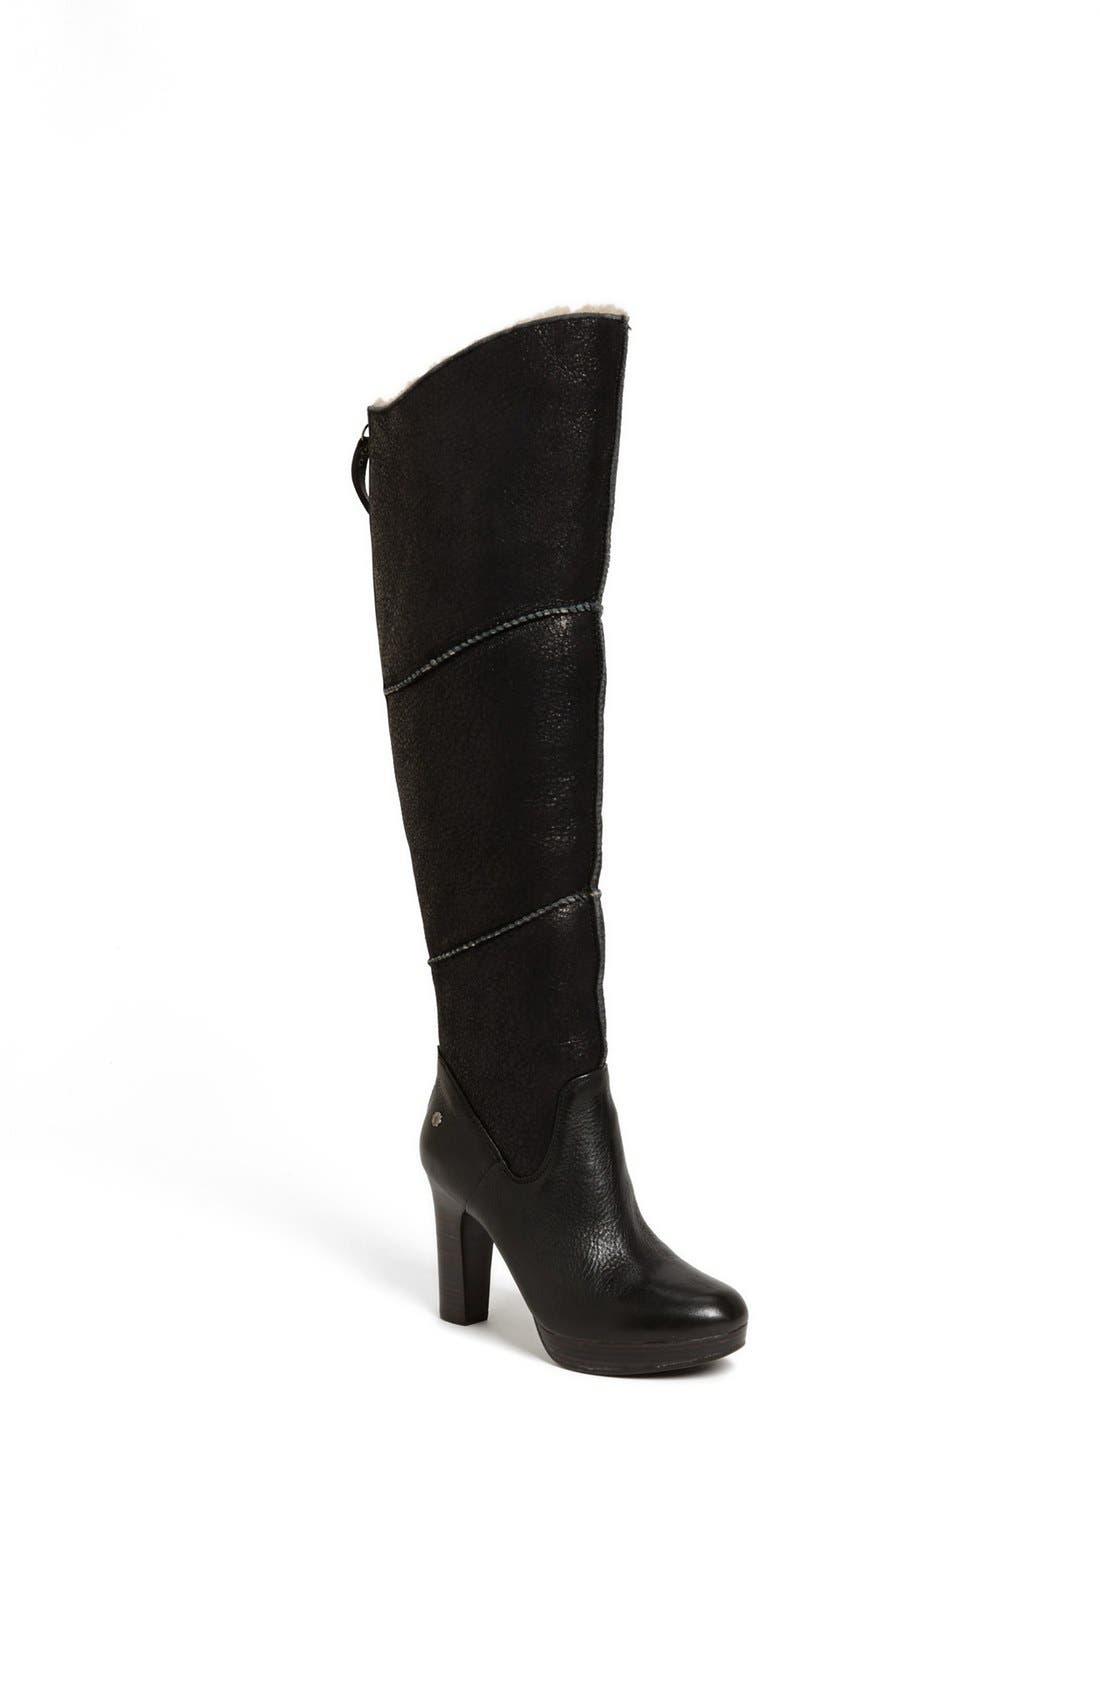 Alternate Image 1 Selected - UGG® Australia 'Dreaux' Boot (Wide Calf)